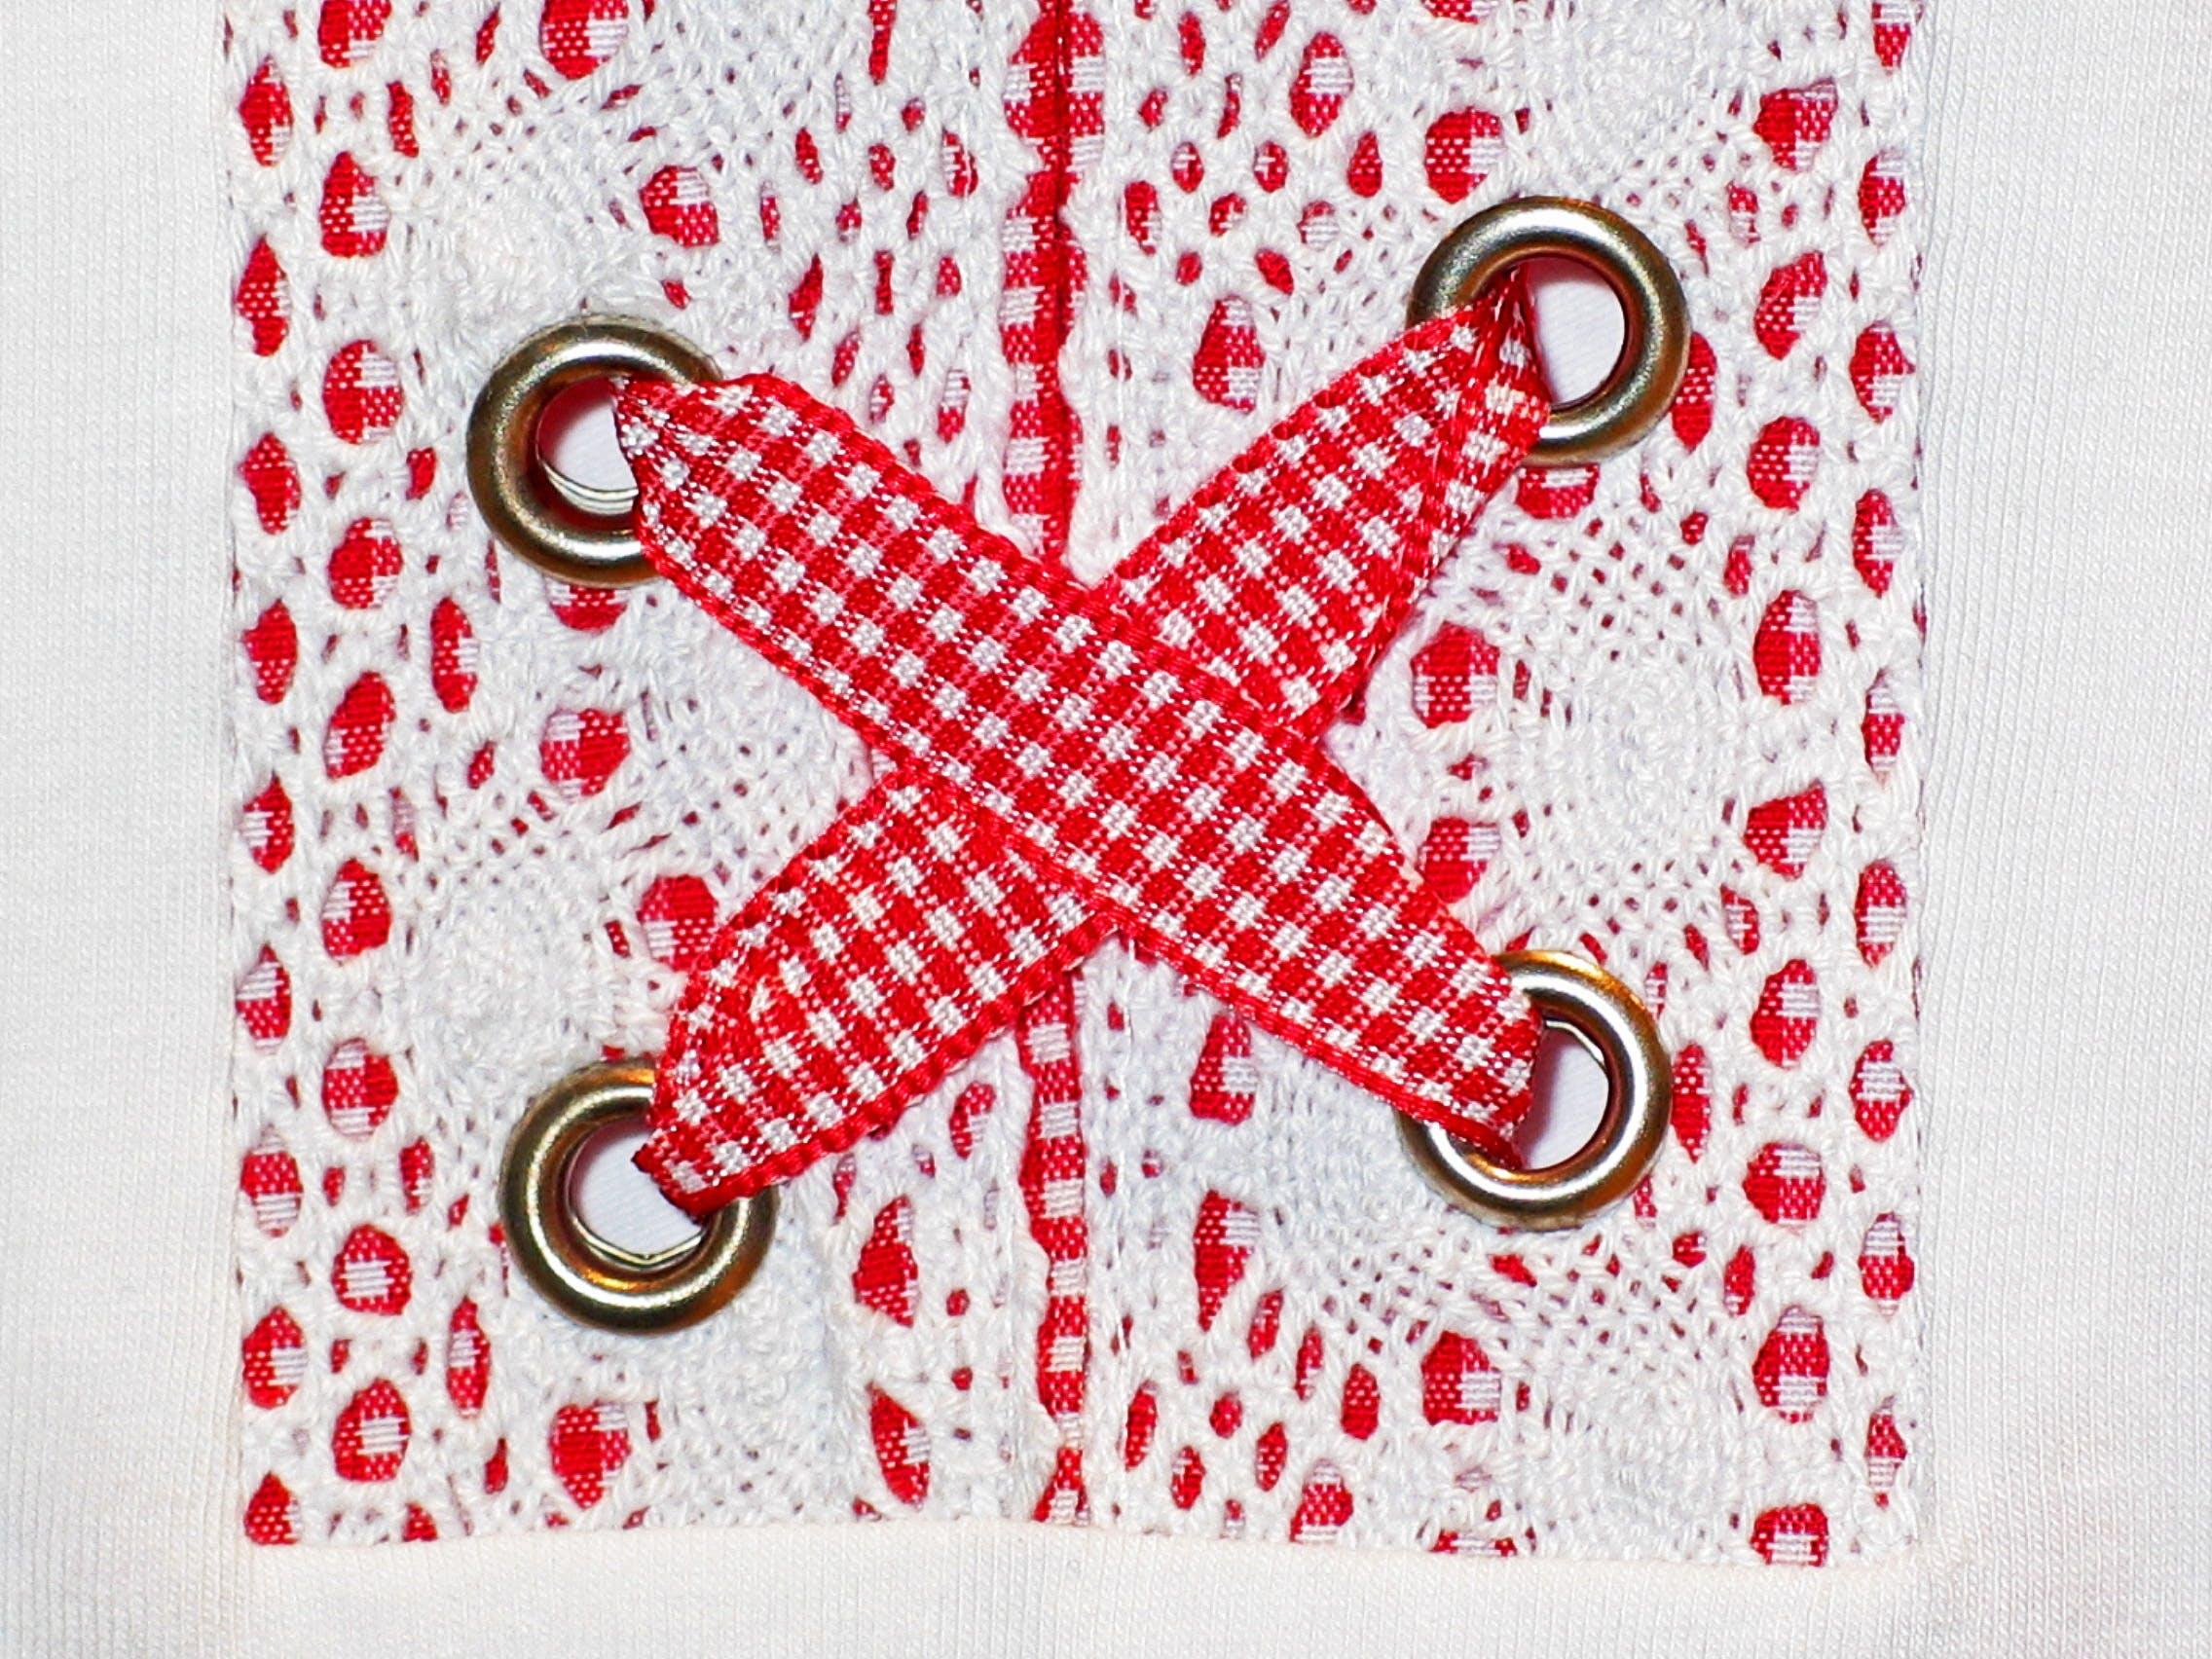 Free stock photo of red, pattern, design, creativity